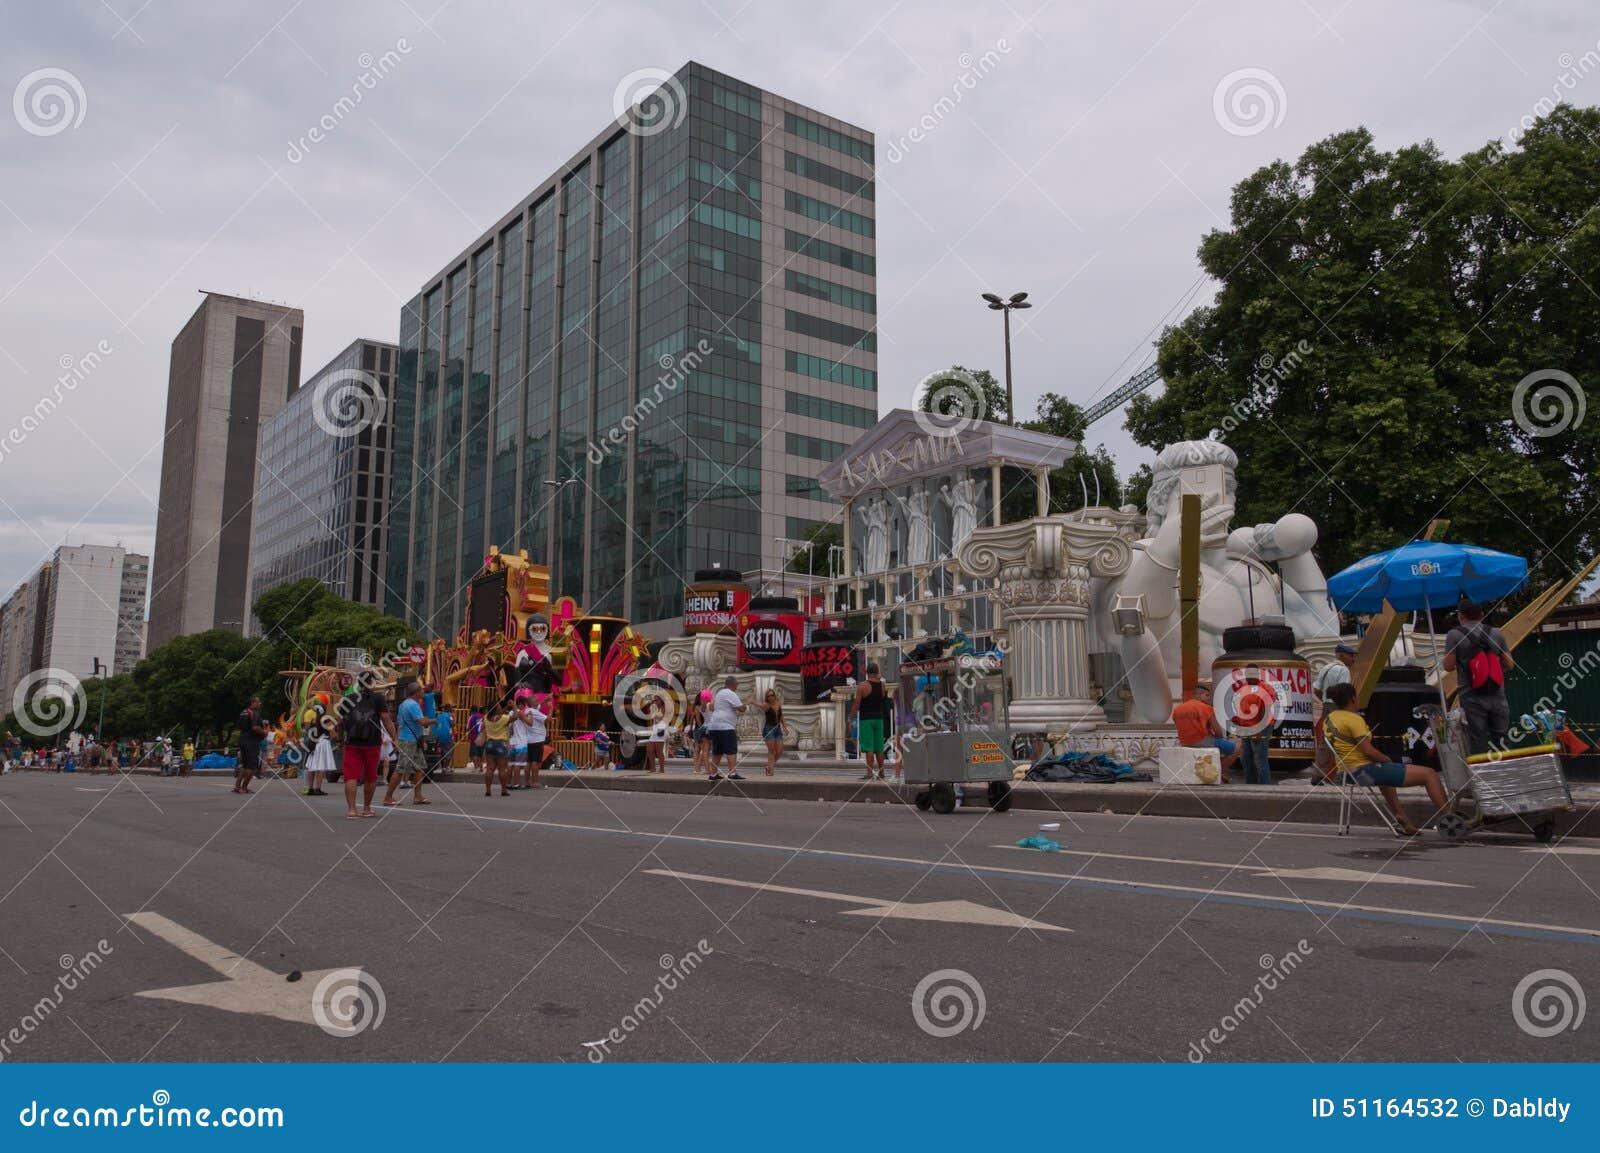 Sikt av den Avenida Presidente Vargas avenyn i Rio de Janeiro under karneval